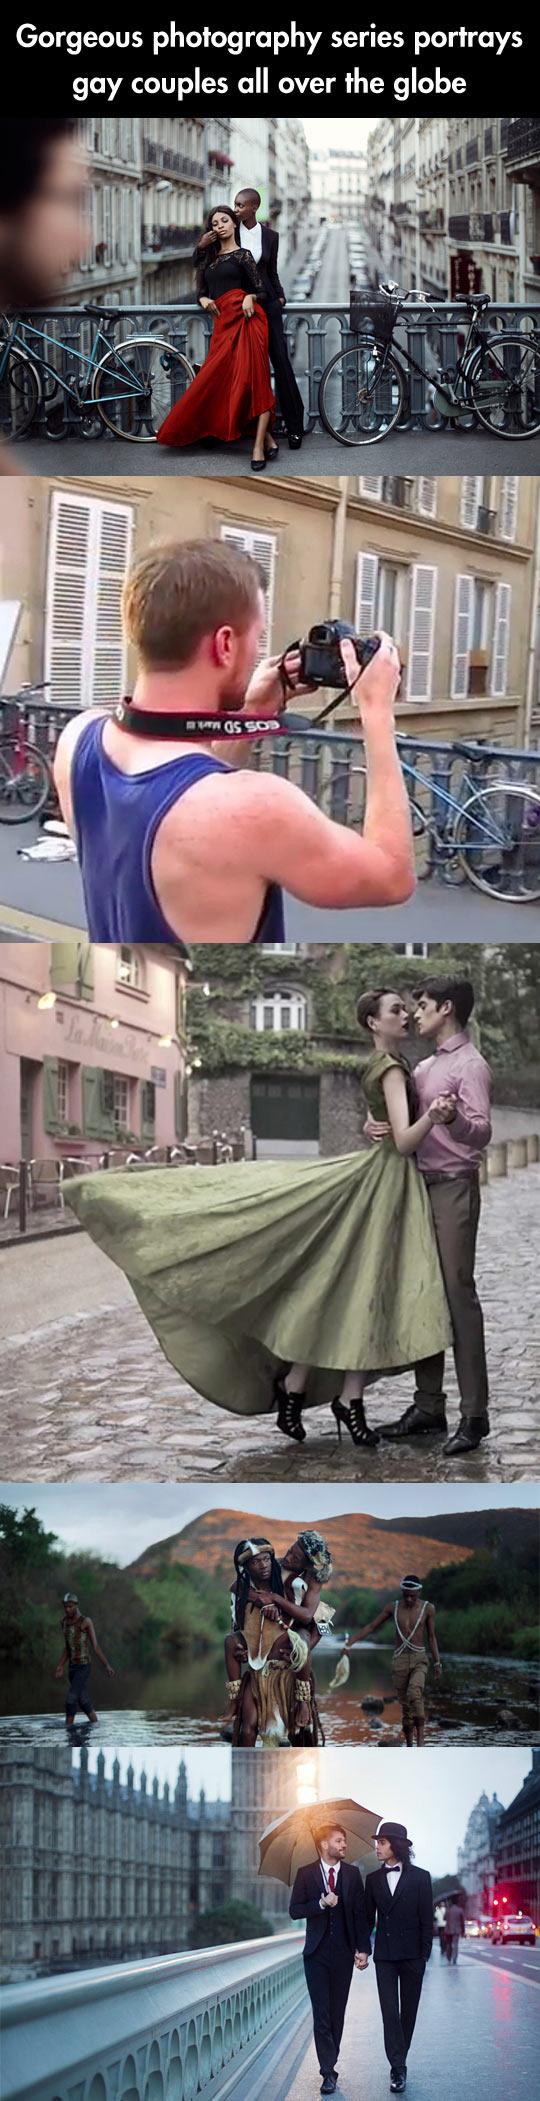 Romance with a single click...